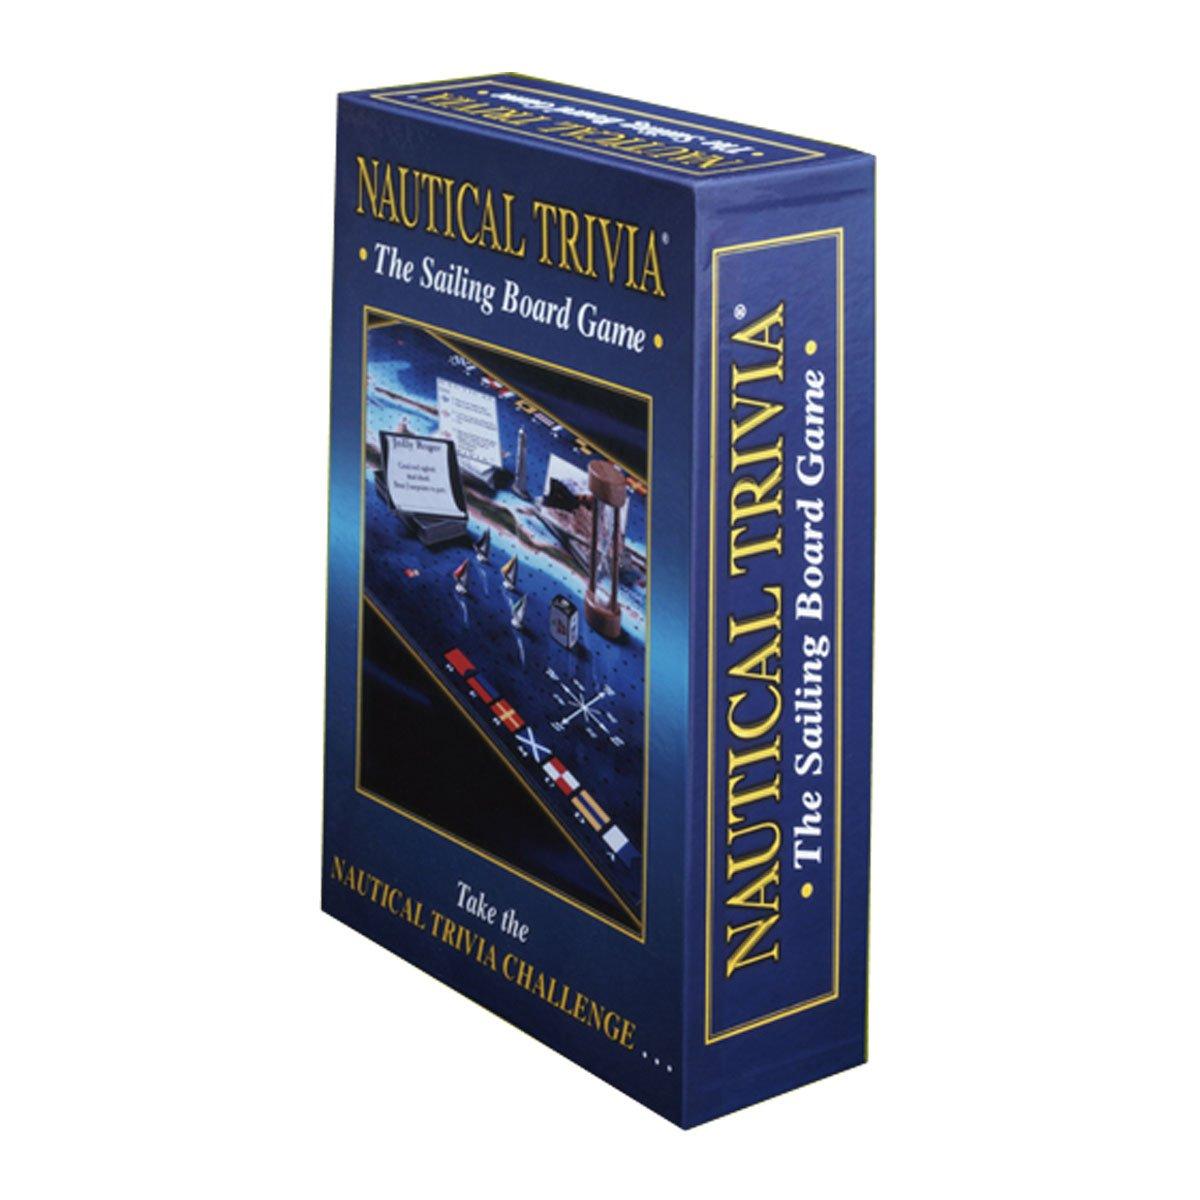 Nautical Trivia Nautical Trivia Game by Nautical Trivia